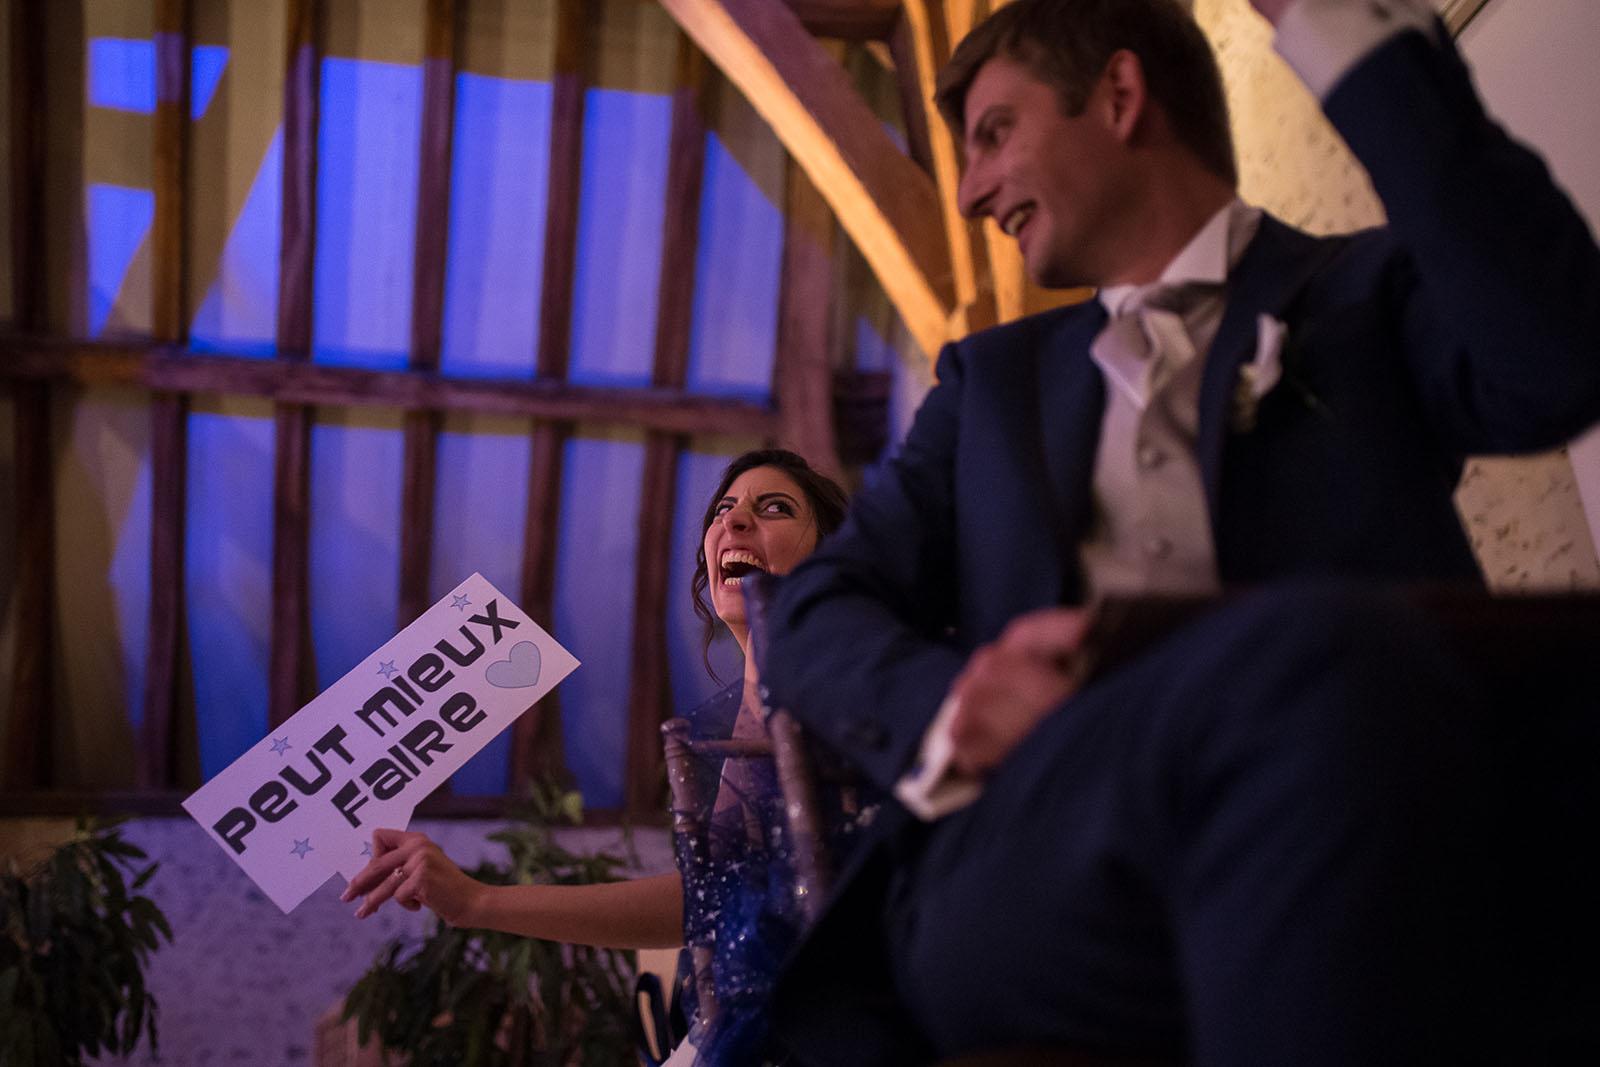 Mariage au Manoir de Corny en Normandie. Animation de la soirée le Il / elle